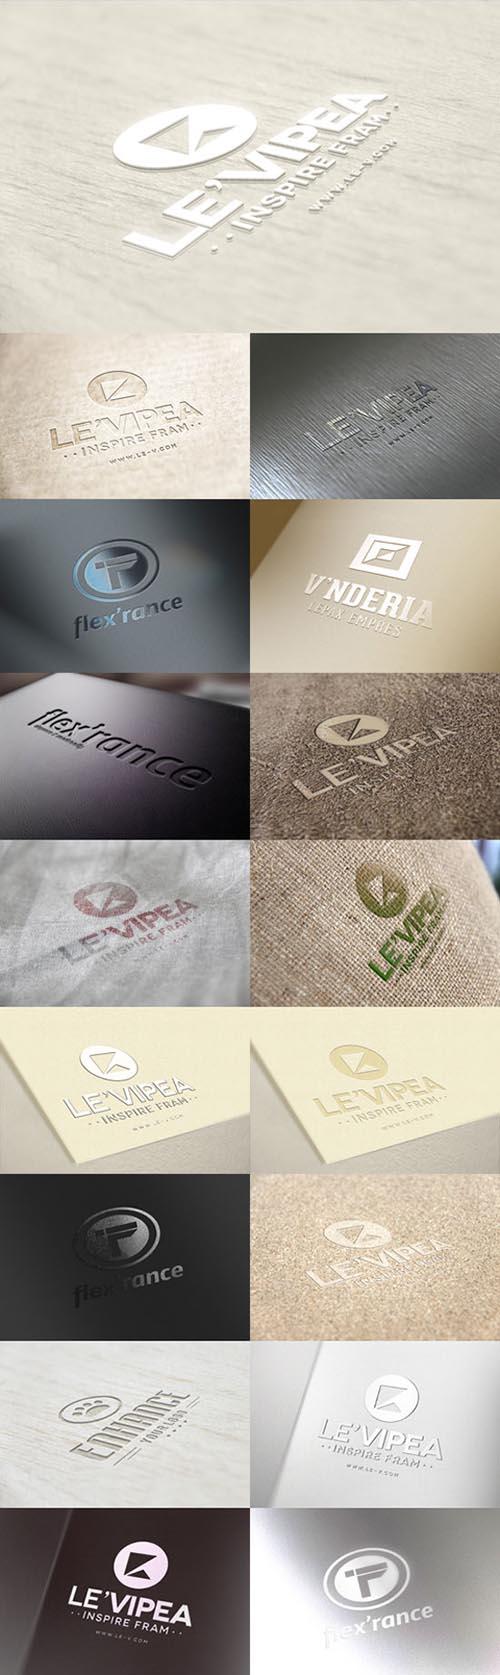 17 logo mockups